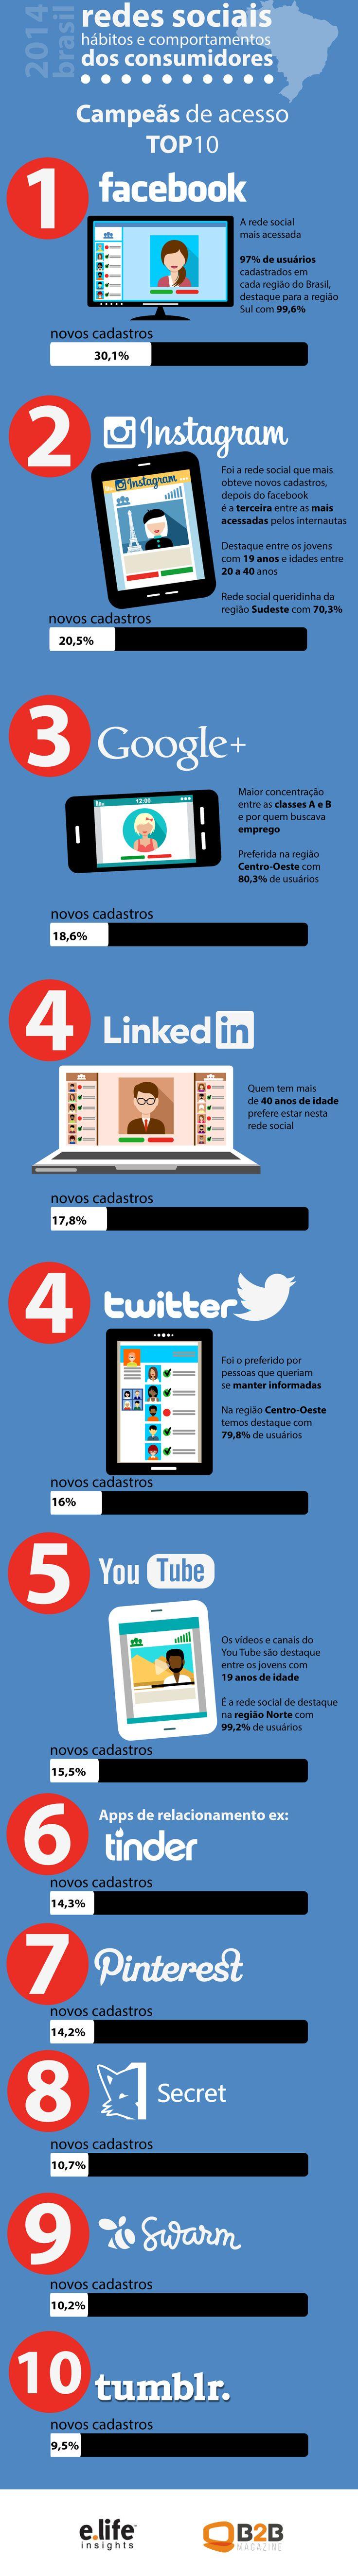 [infográfico] As redes sociais preferidas do brasileiro   Mkt Sem Gravata  via:marketingsemgravata  #marketindigital #brasil #modernistablog